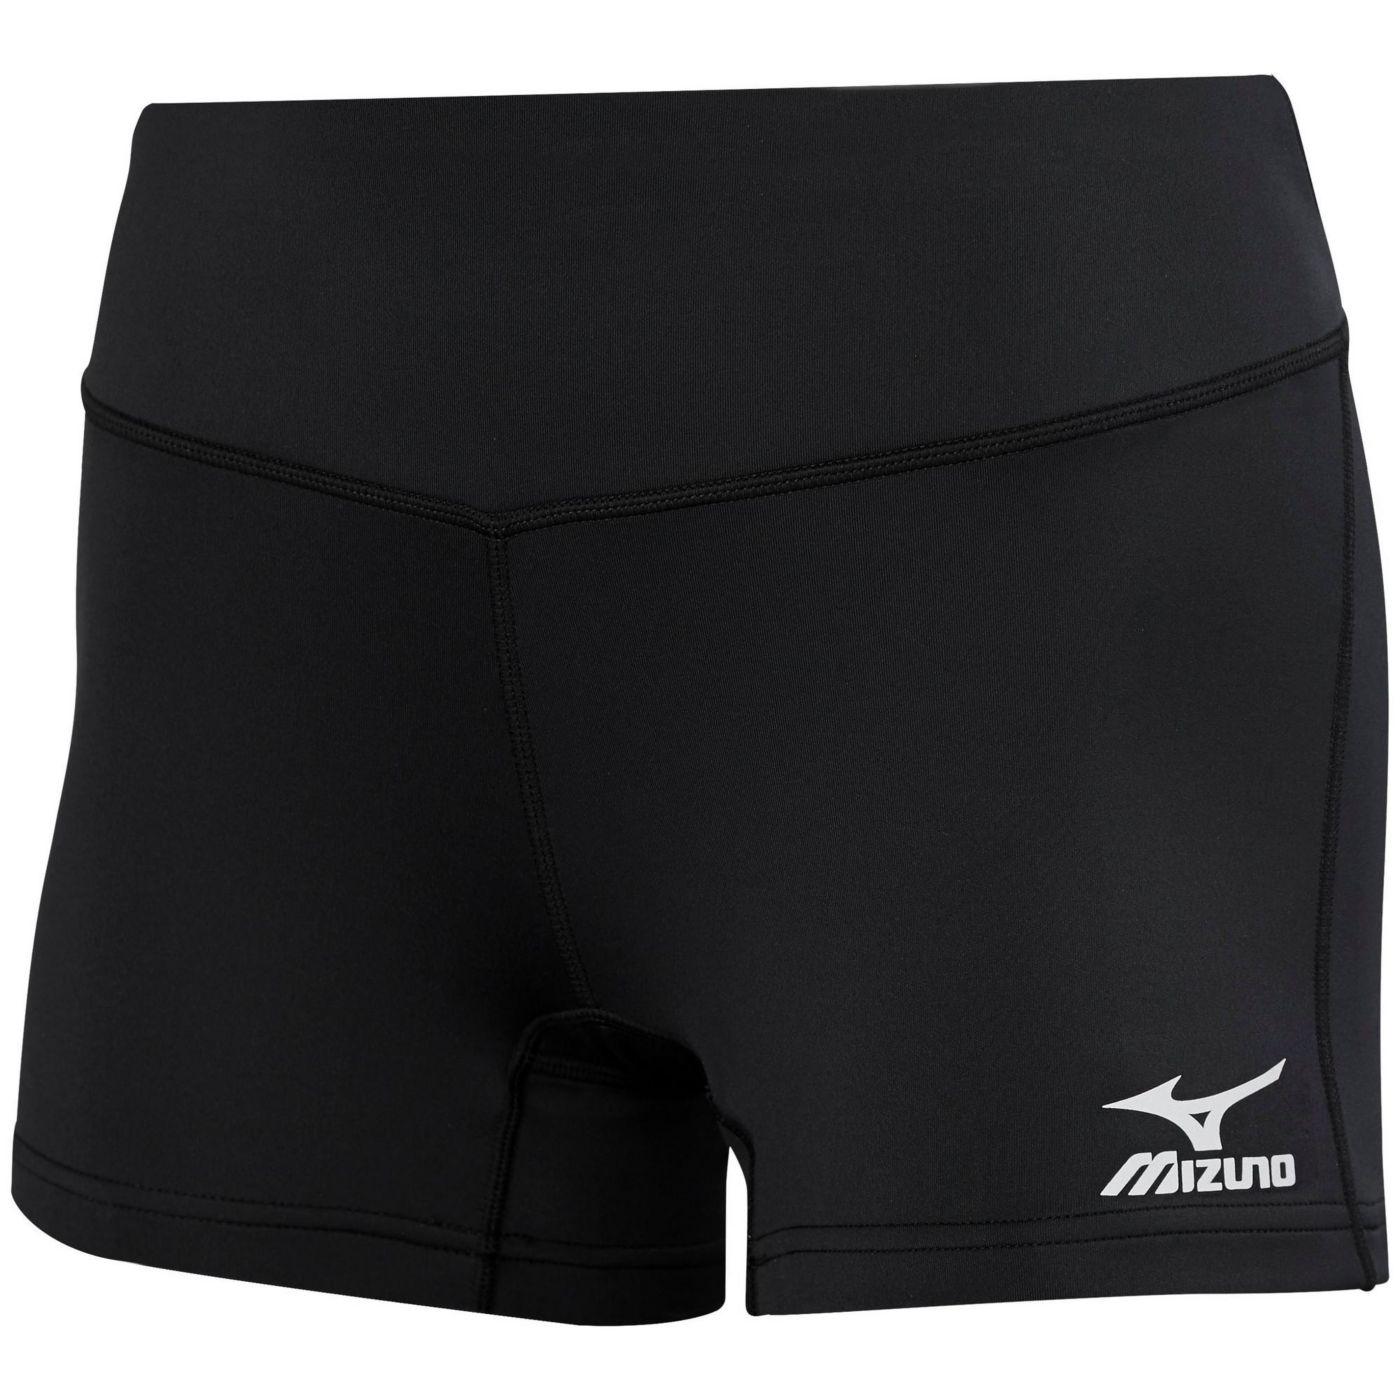 "Mizuno Women's Victory 3.5"" Volleyball Shorts"